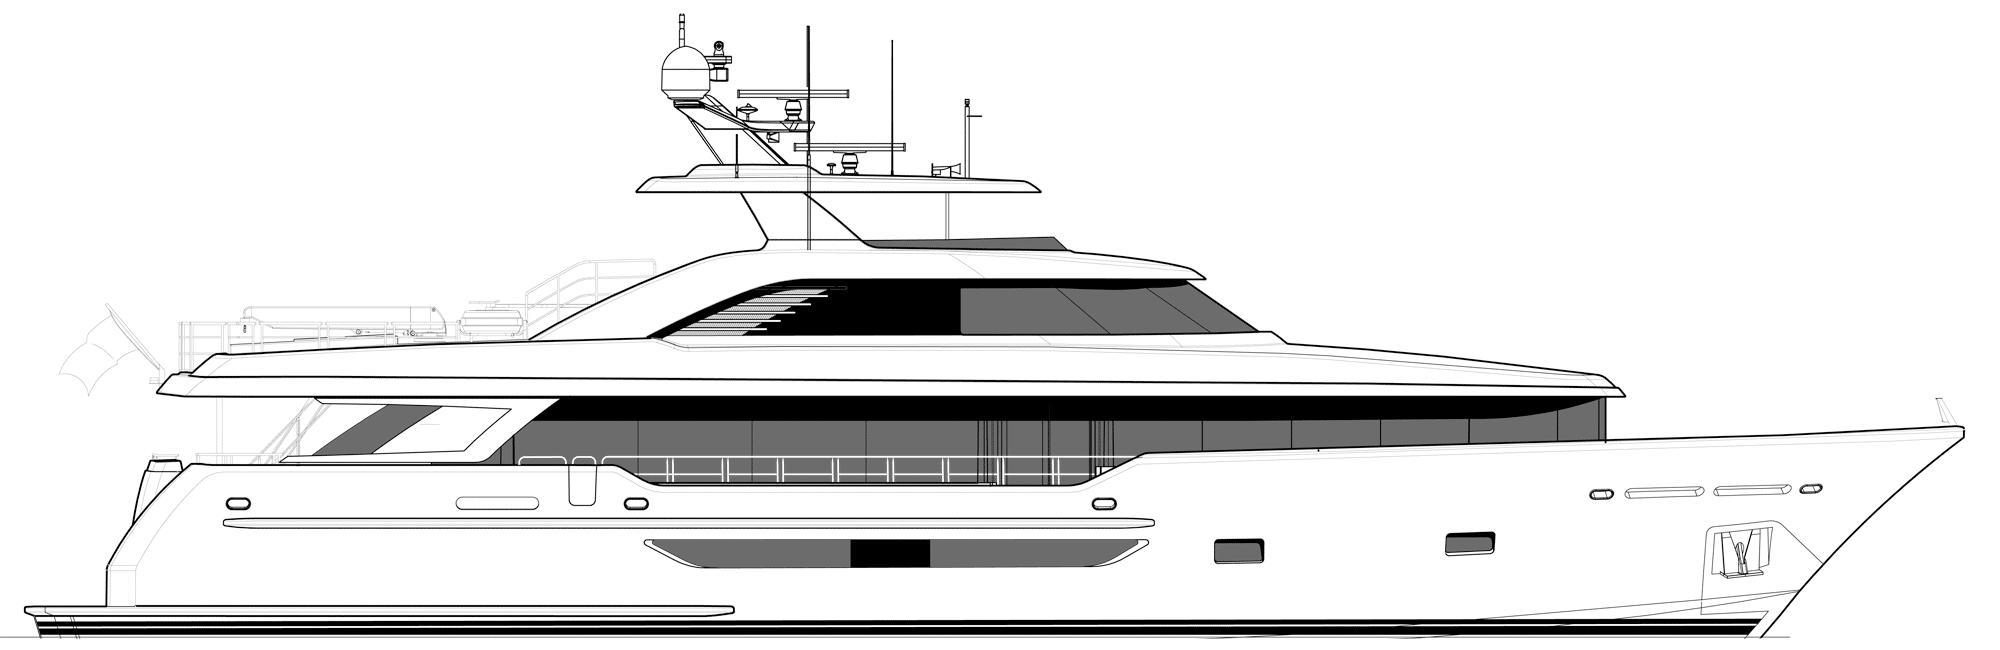 Westport W117 - 35m   Profile